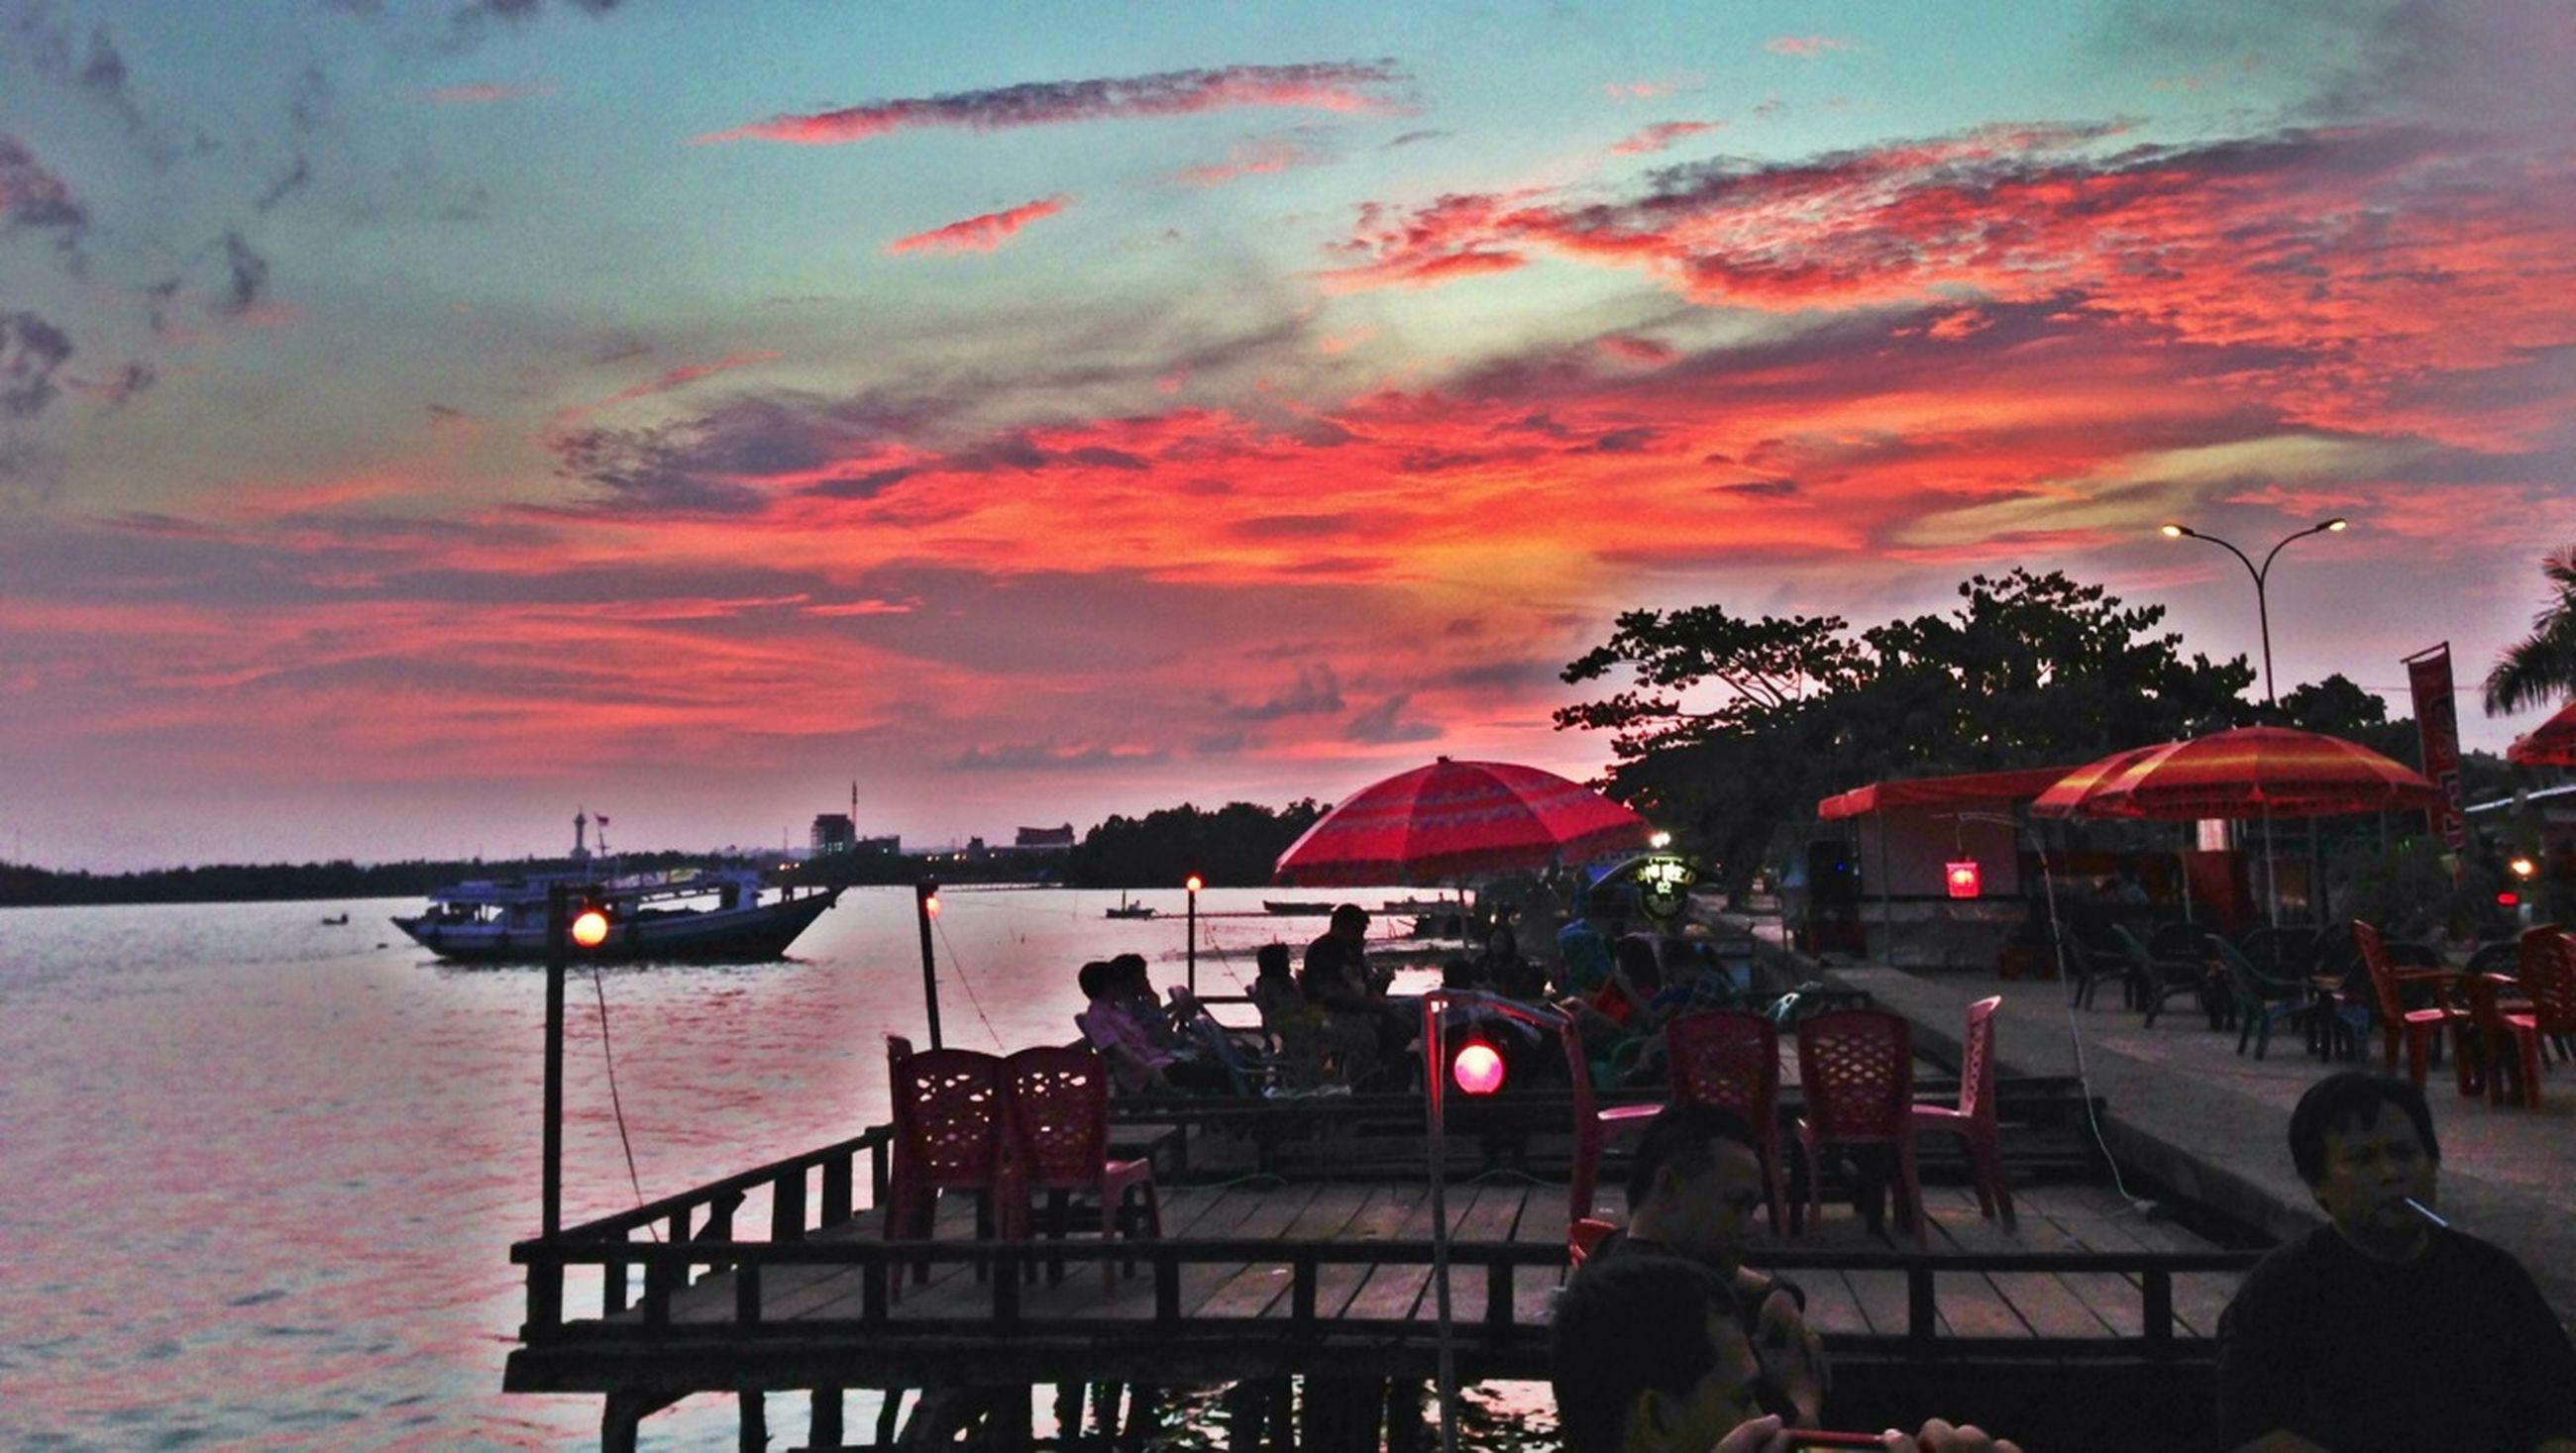 sunset, sky, water, cloud - sky, sea, transportation, lifestyles, dusk, leisure activity, person, mode of transport, silhouette, nautical vessel, nature, men, cloud, orange color, railing, outdoors